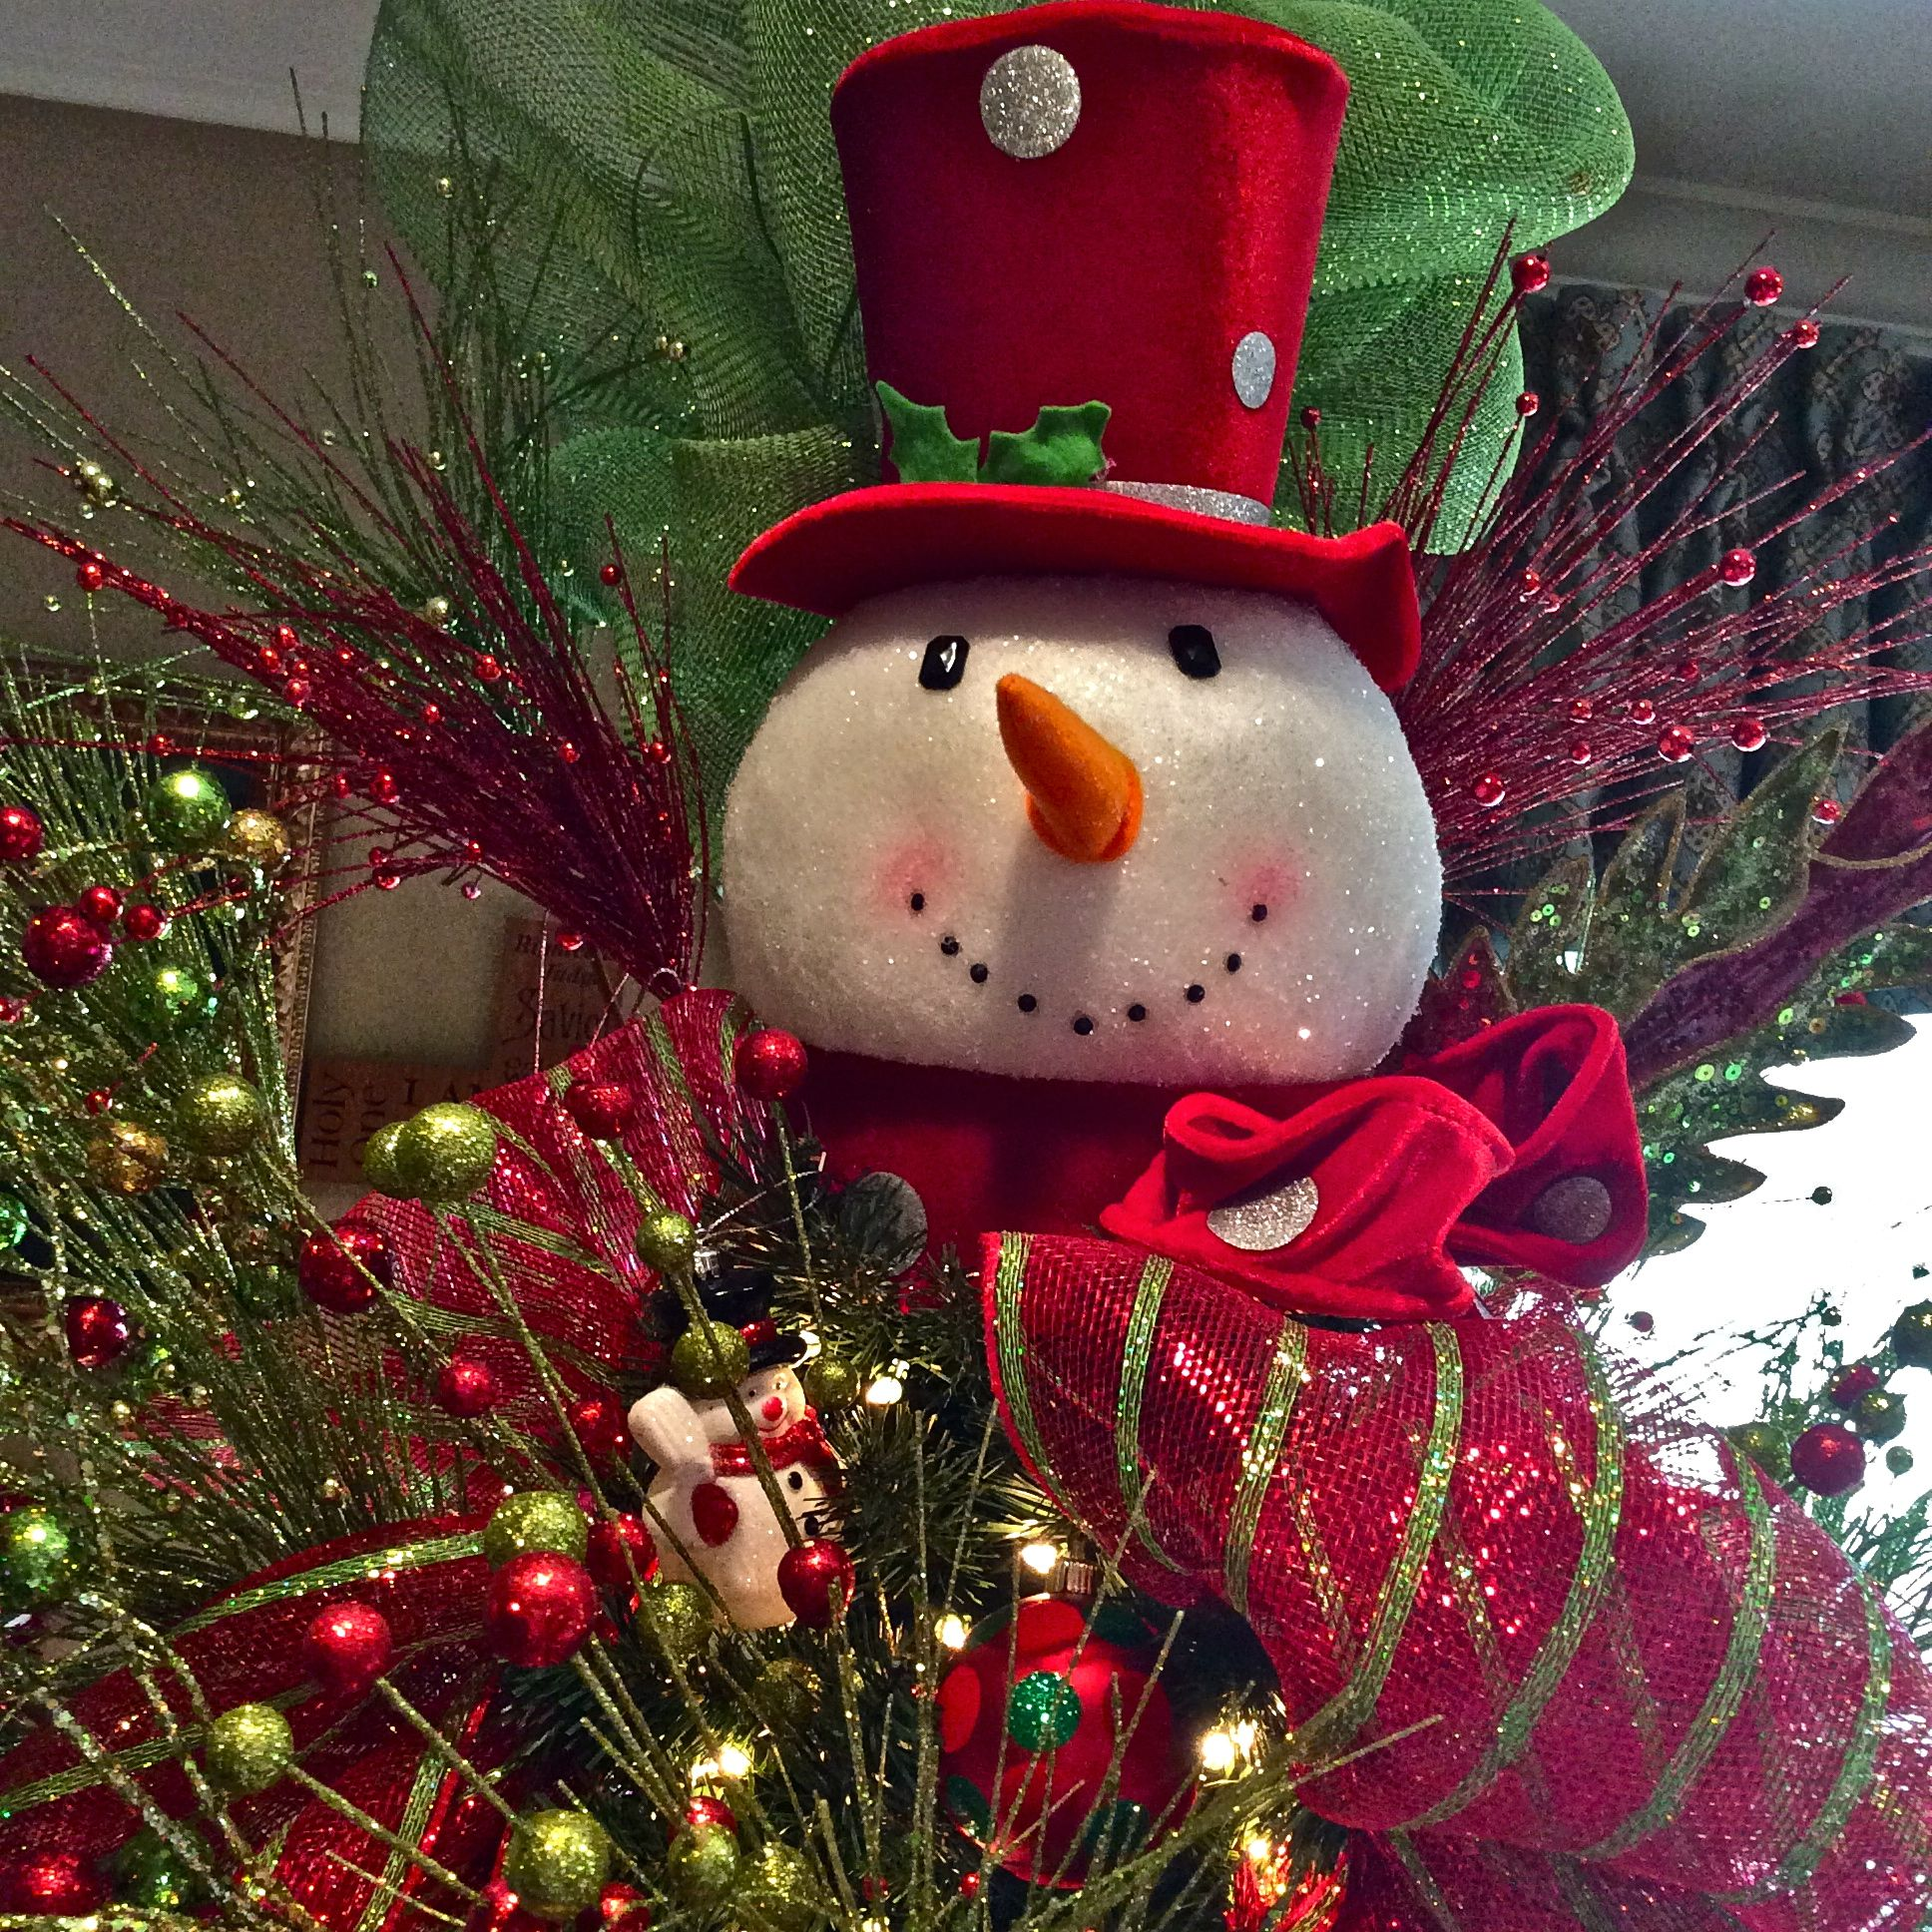 Snowman Tree Topper | CHRISTmas | Pinterest | Snowman tree topper ...